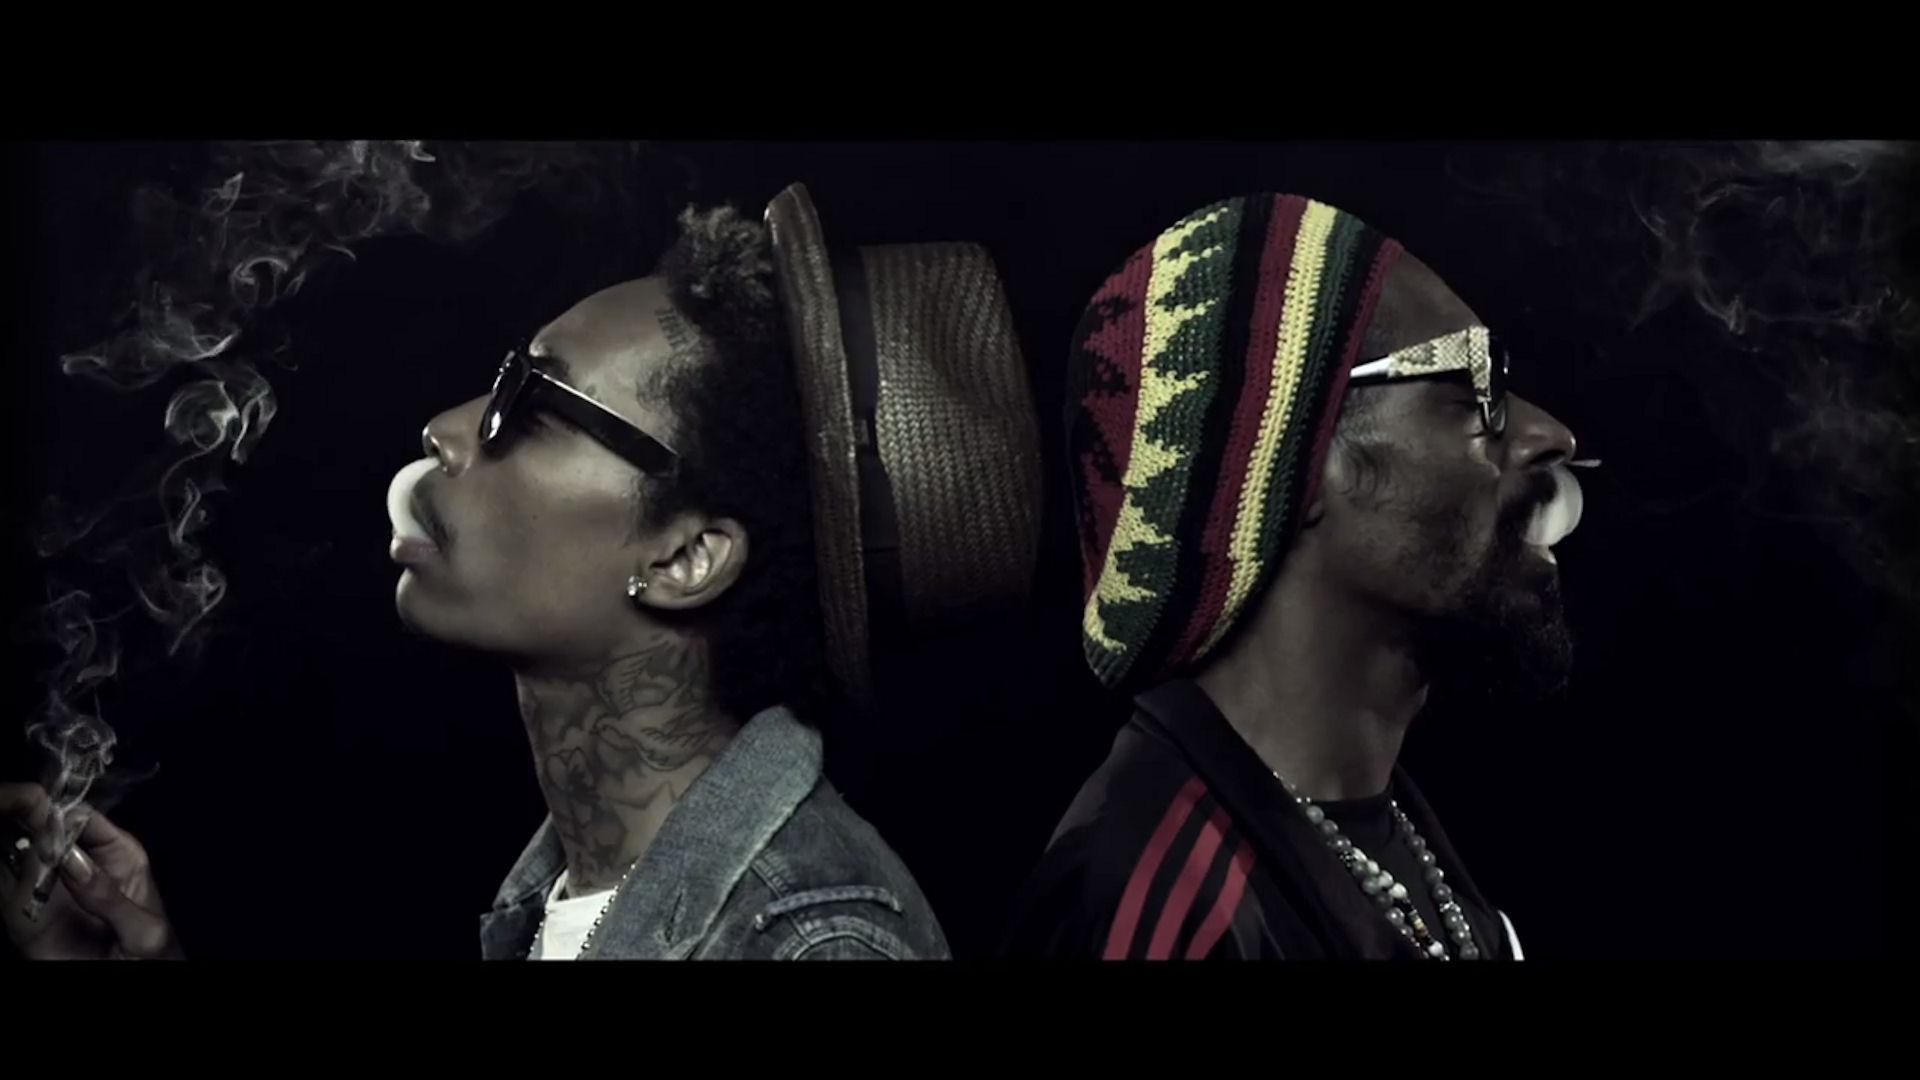 Wiz Khalifa and Snoop Dogg Smoking • Rap Wallpapers